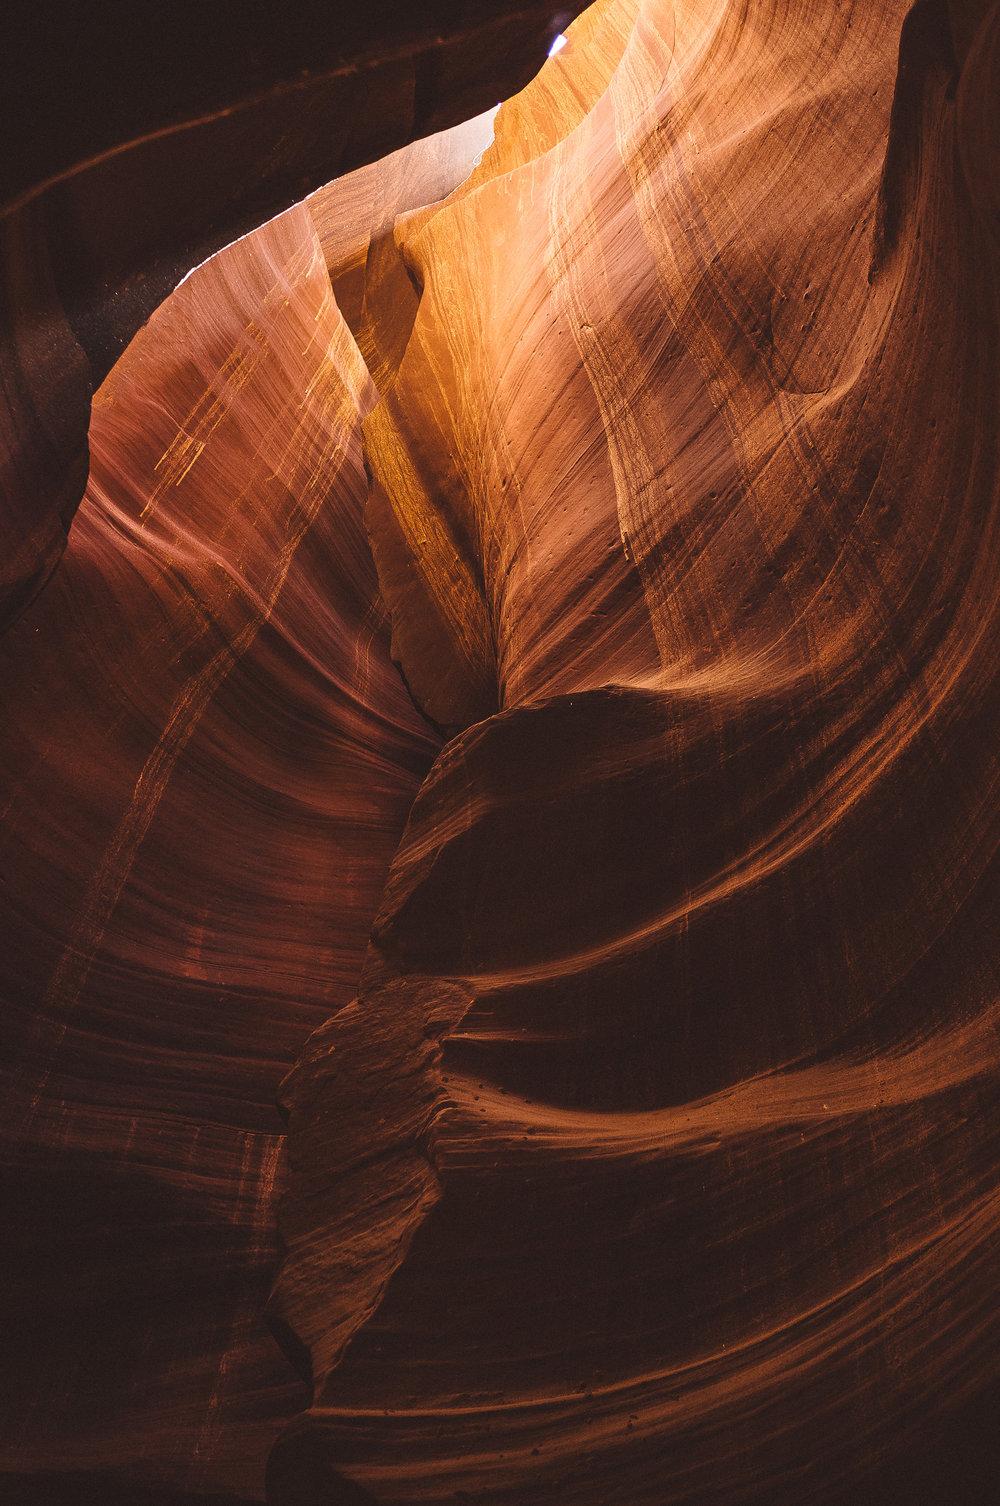 thomas wywrot photography photographer travel camping road trip camera vsco portra fuji fujifilm x100 antelope canyon arizona